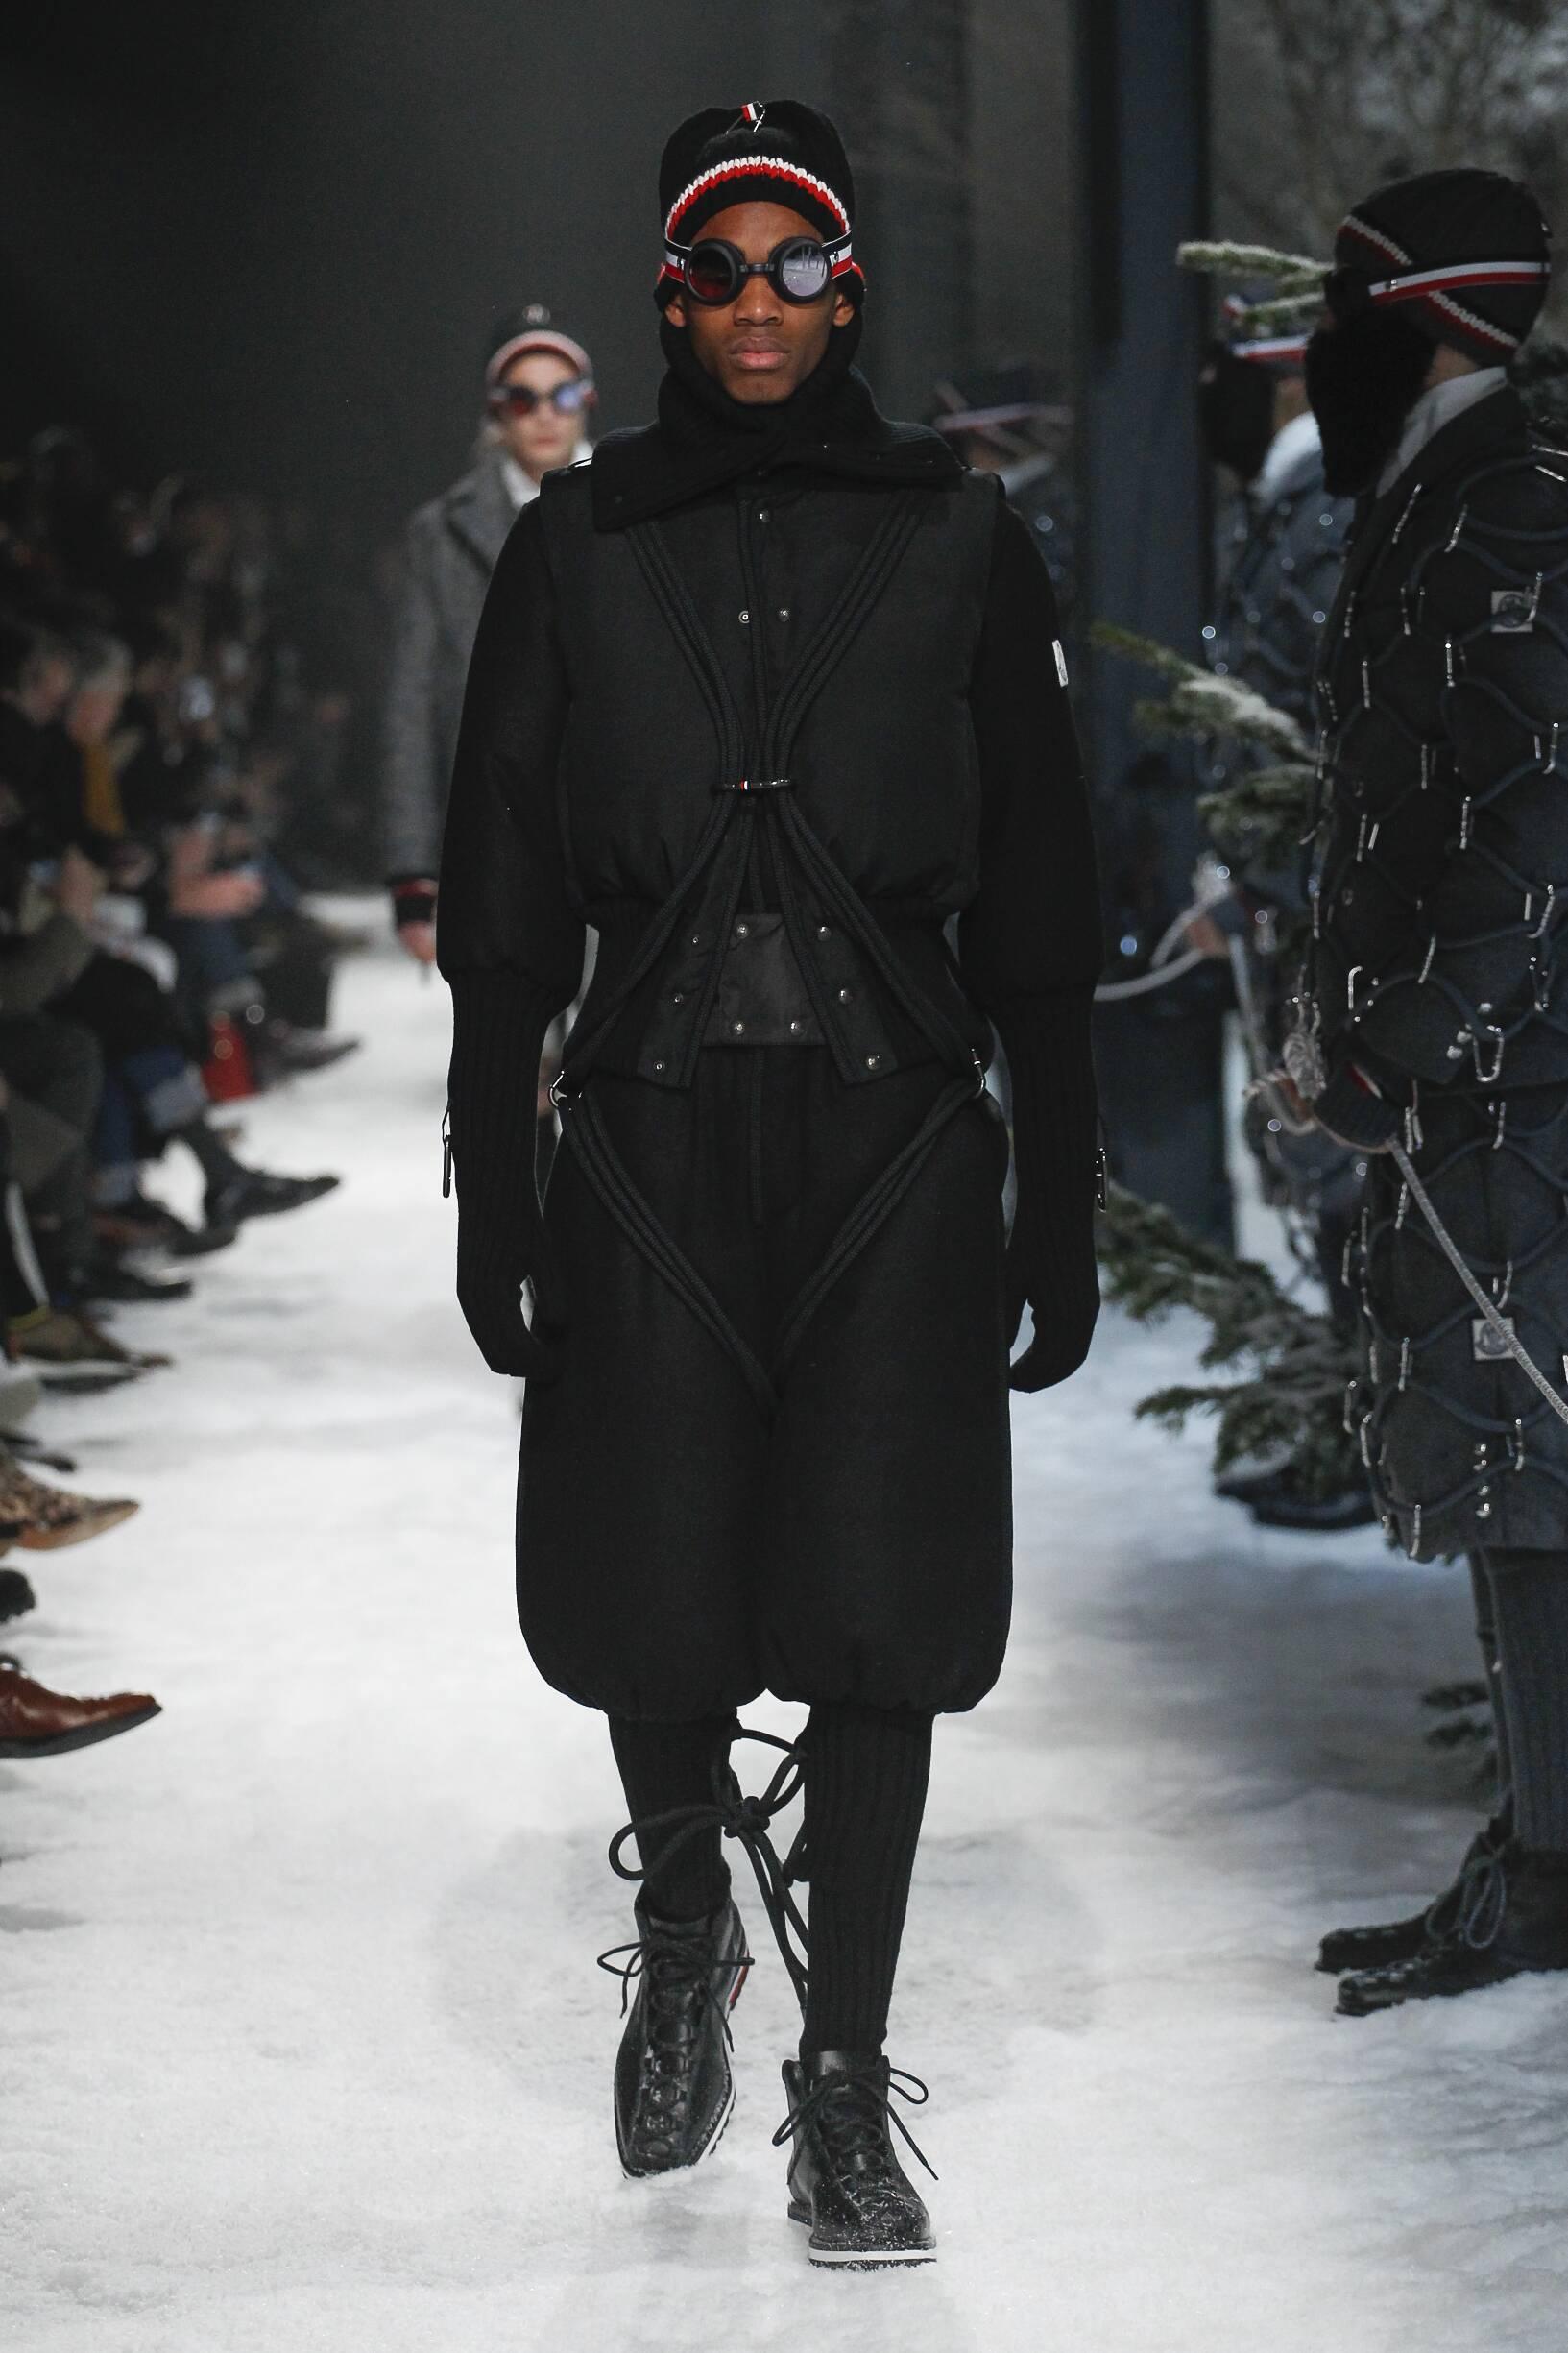 Fall Winter 2017 Man Milan Moncler Gamme Bleu Collection